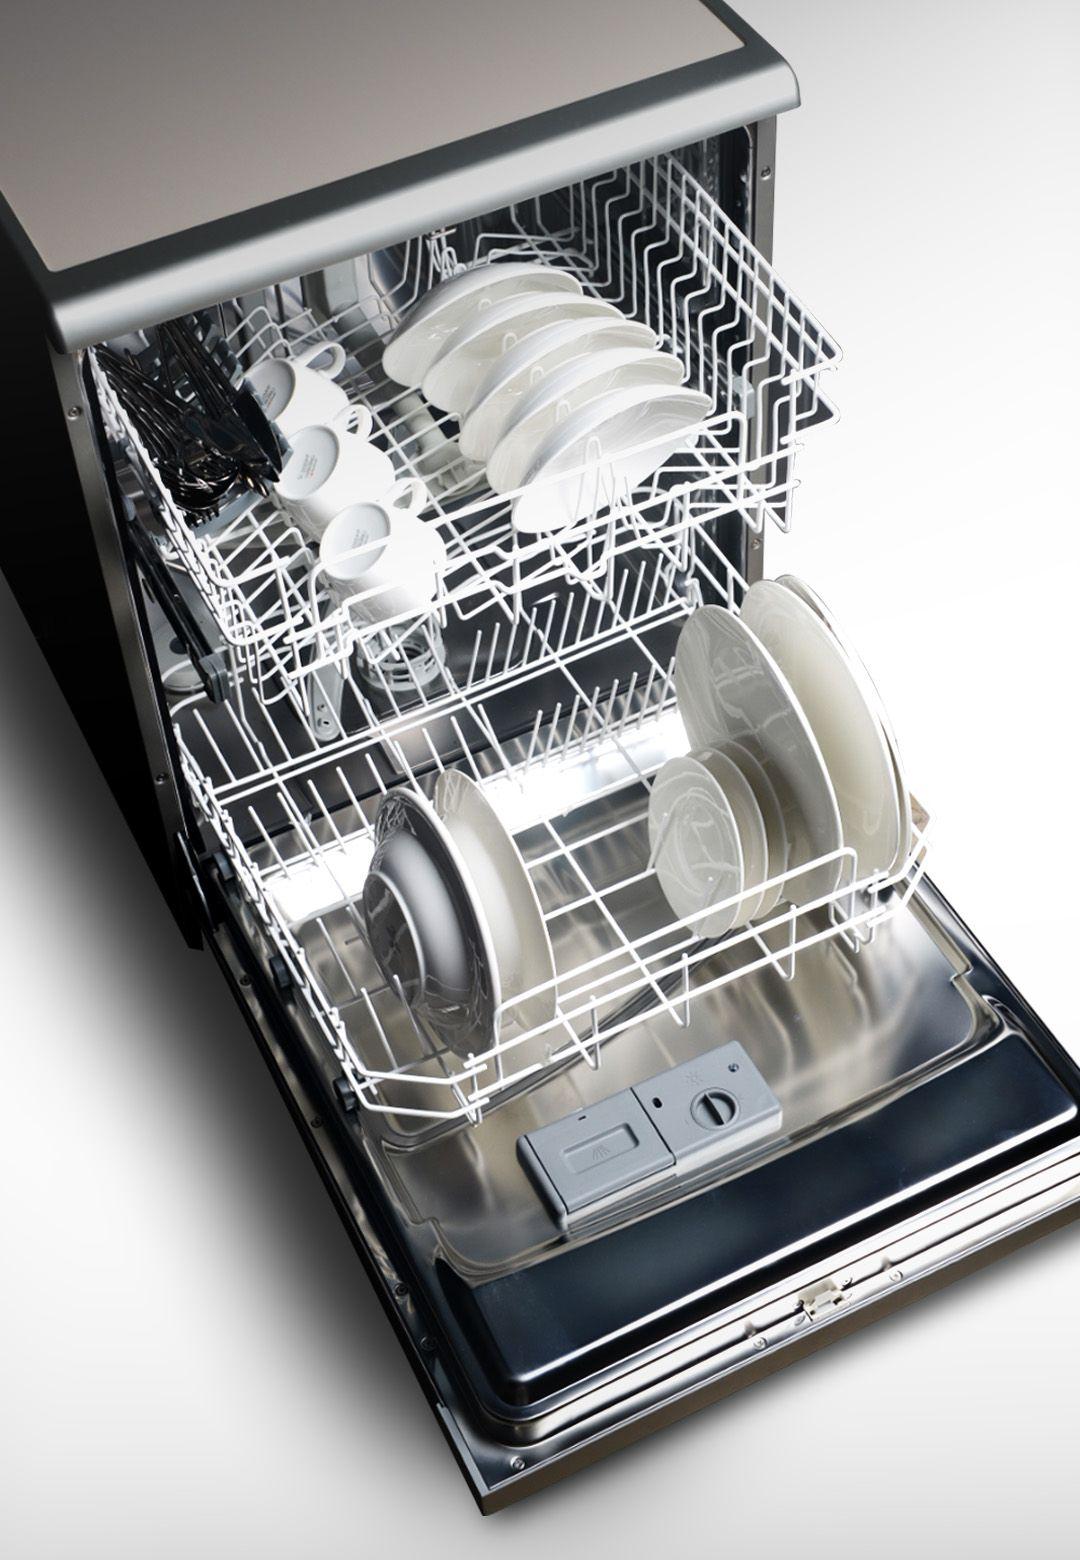 Modena Appliances Mesin Cuci Mesin Cuci Piring Mesin